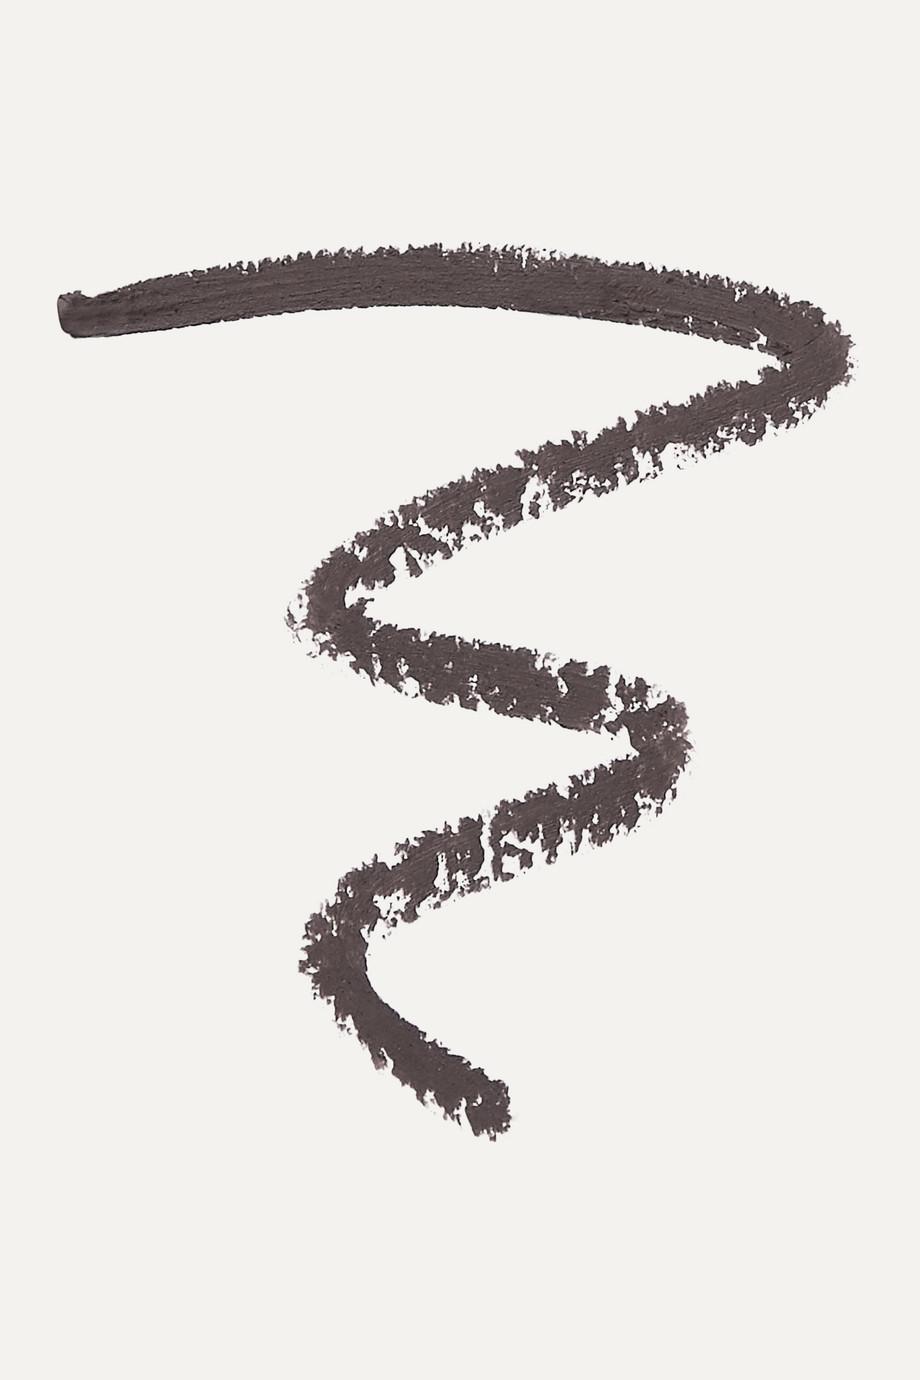 NARS High-Pigment Longwear Eyeliner - Haight-Ashbury